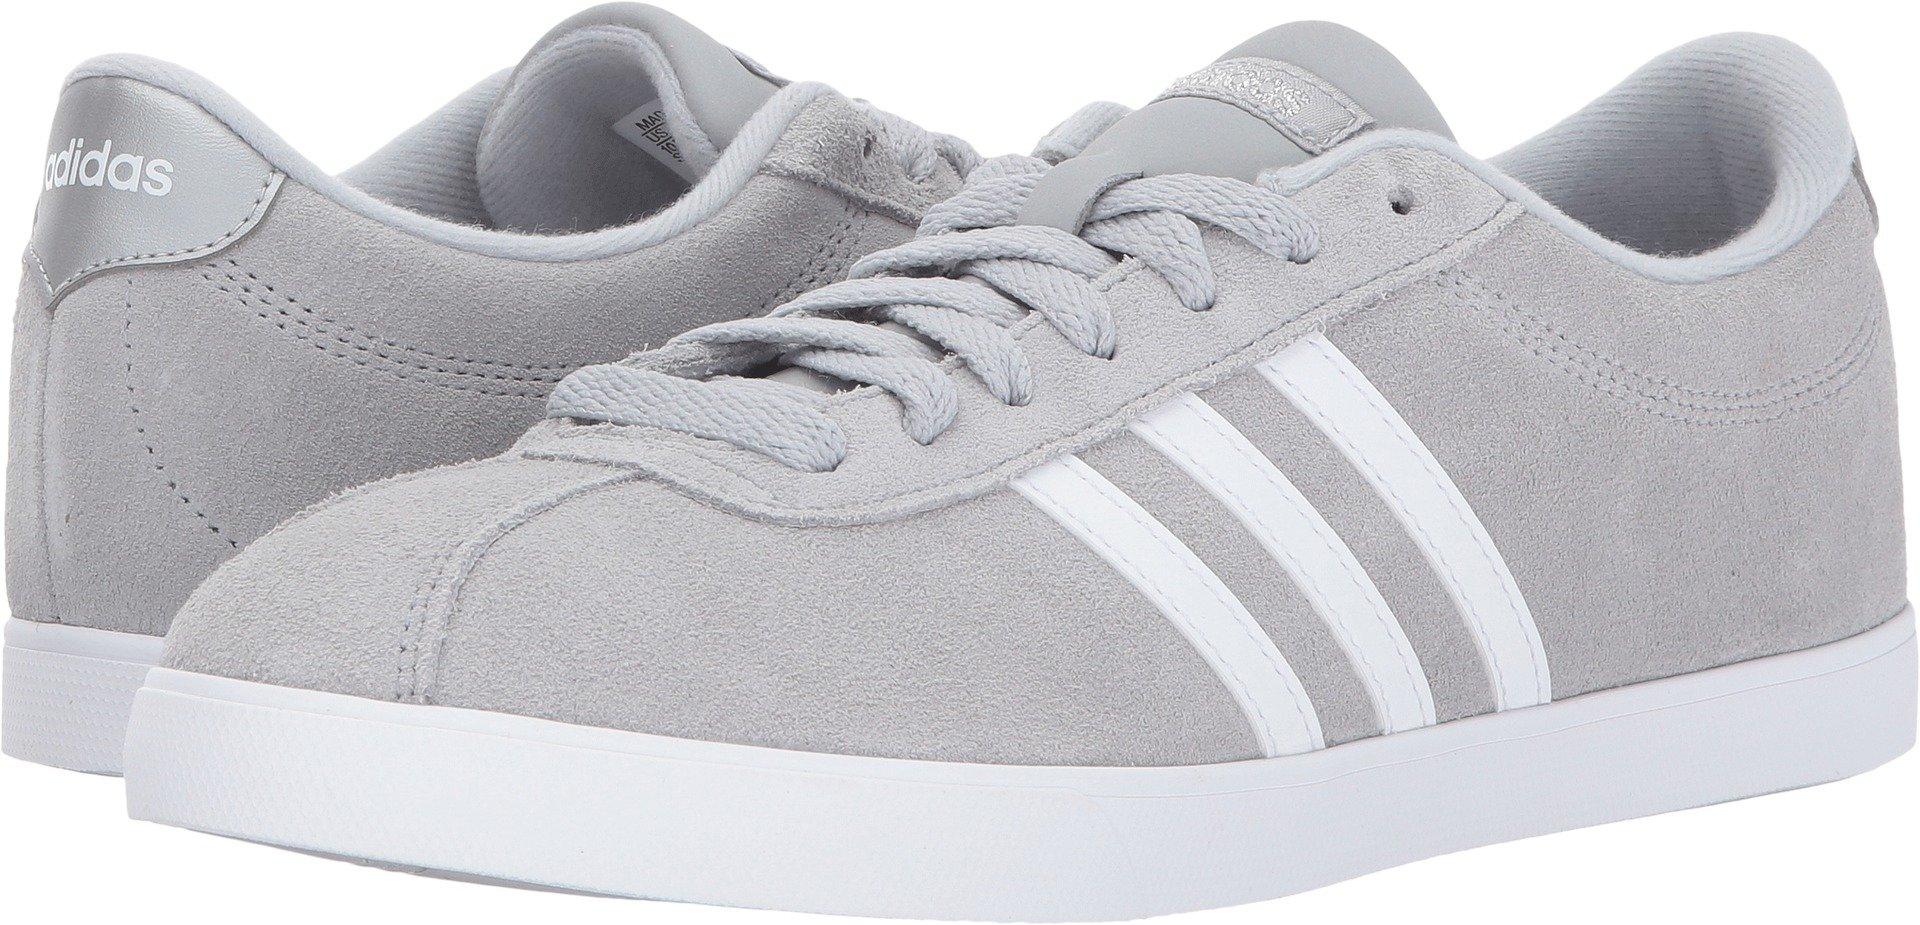 adidas Women's Shoes | Courtset Sneakers, Light Onix/White/Metallic Silver, (7.5 M US)